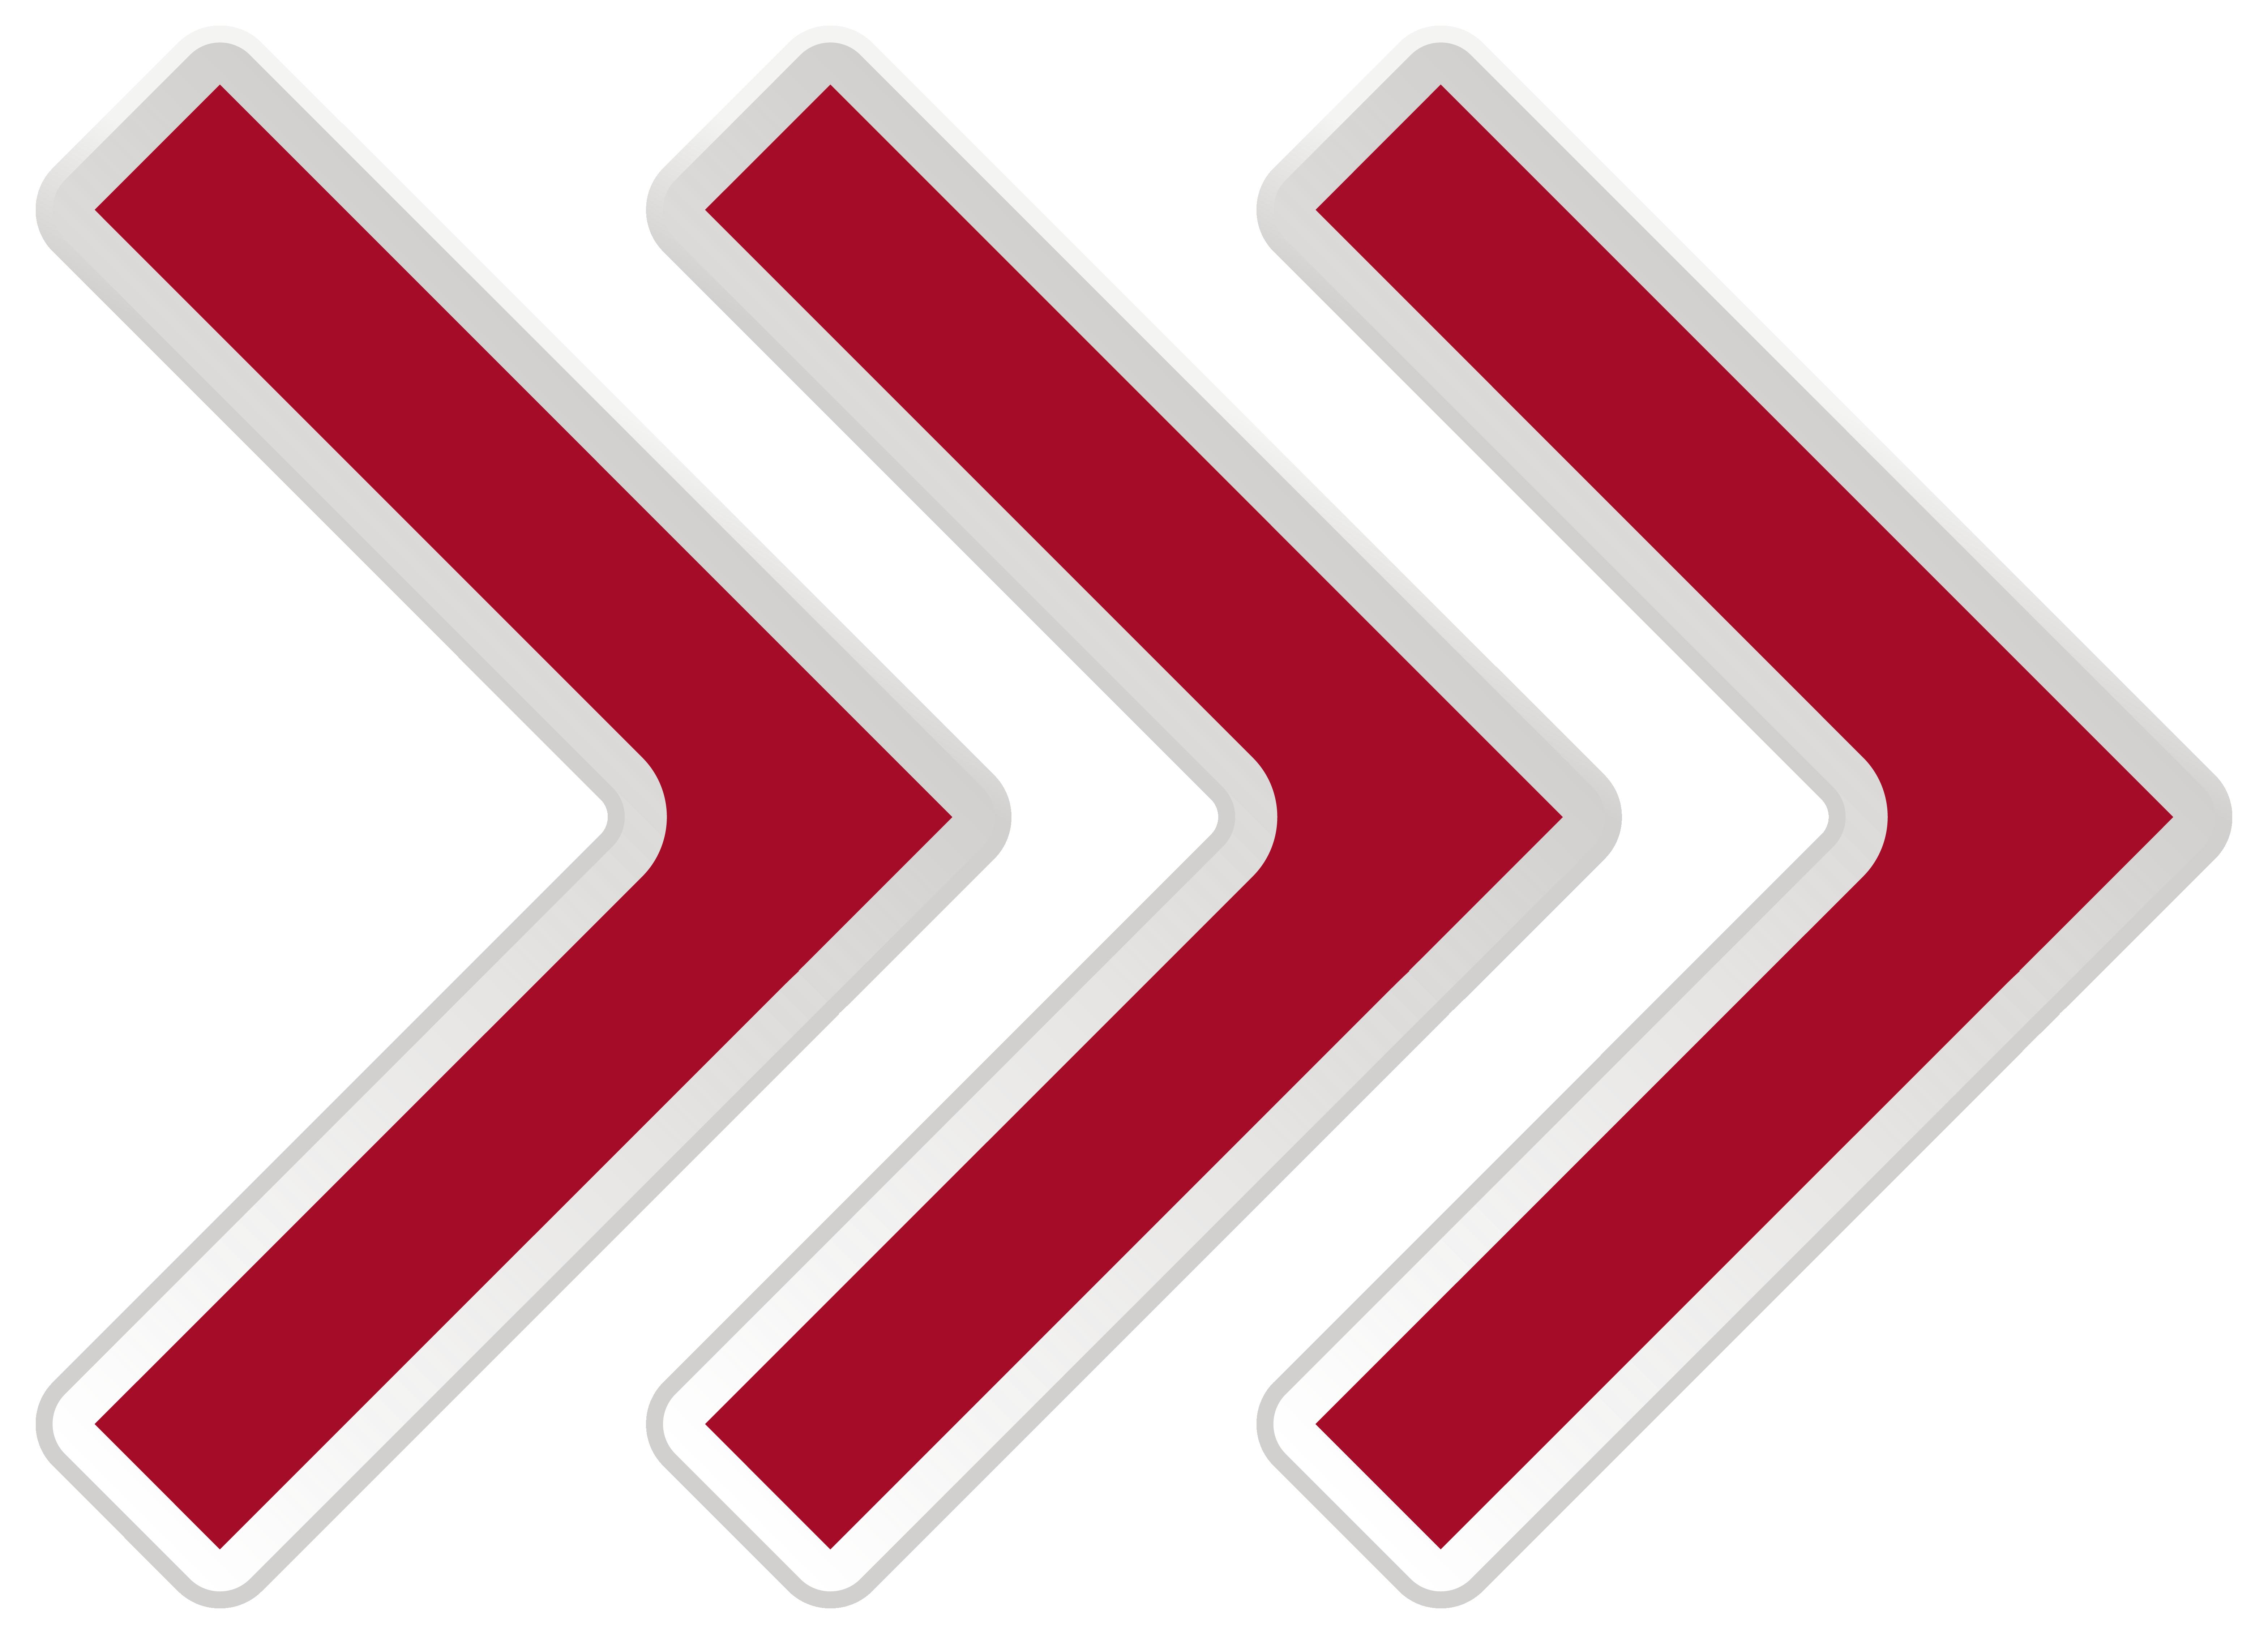 Red arrow transparent clipart best for Transparent top design